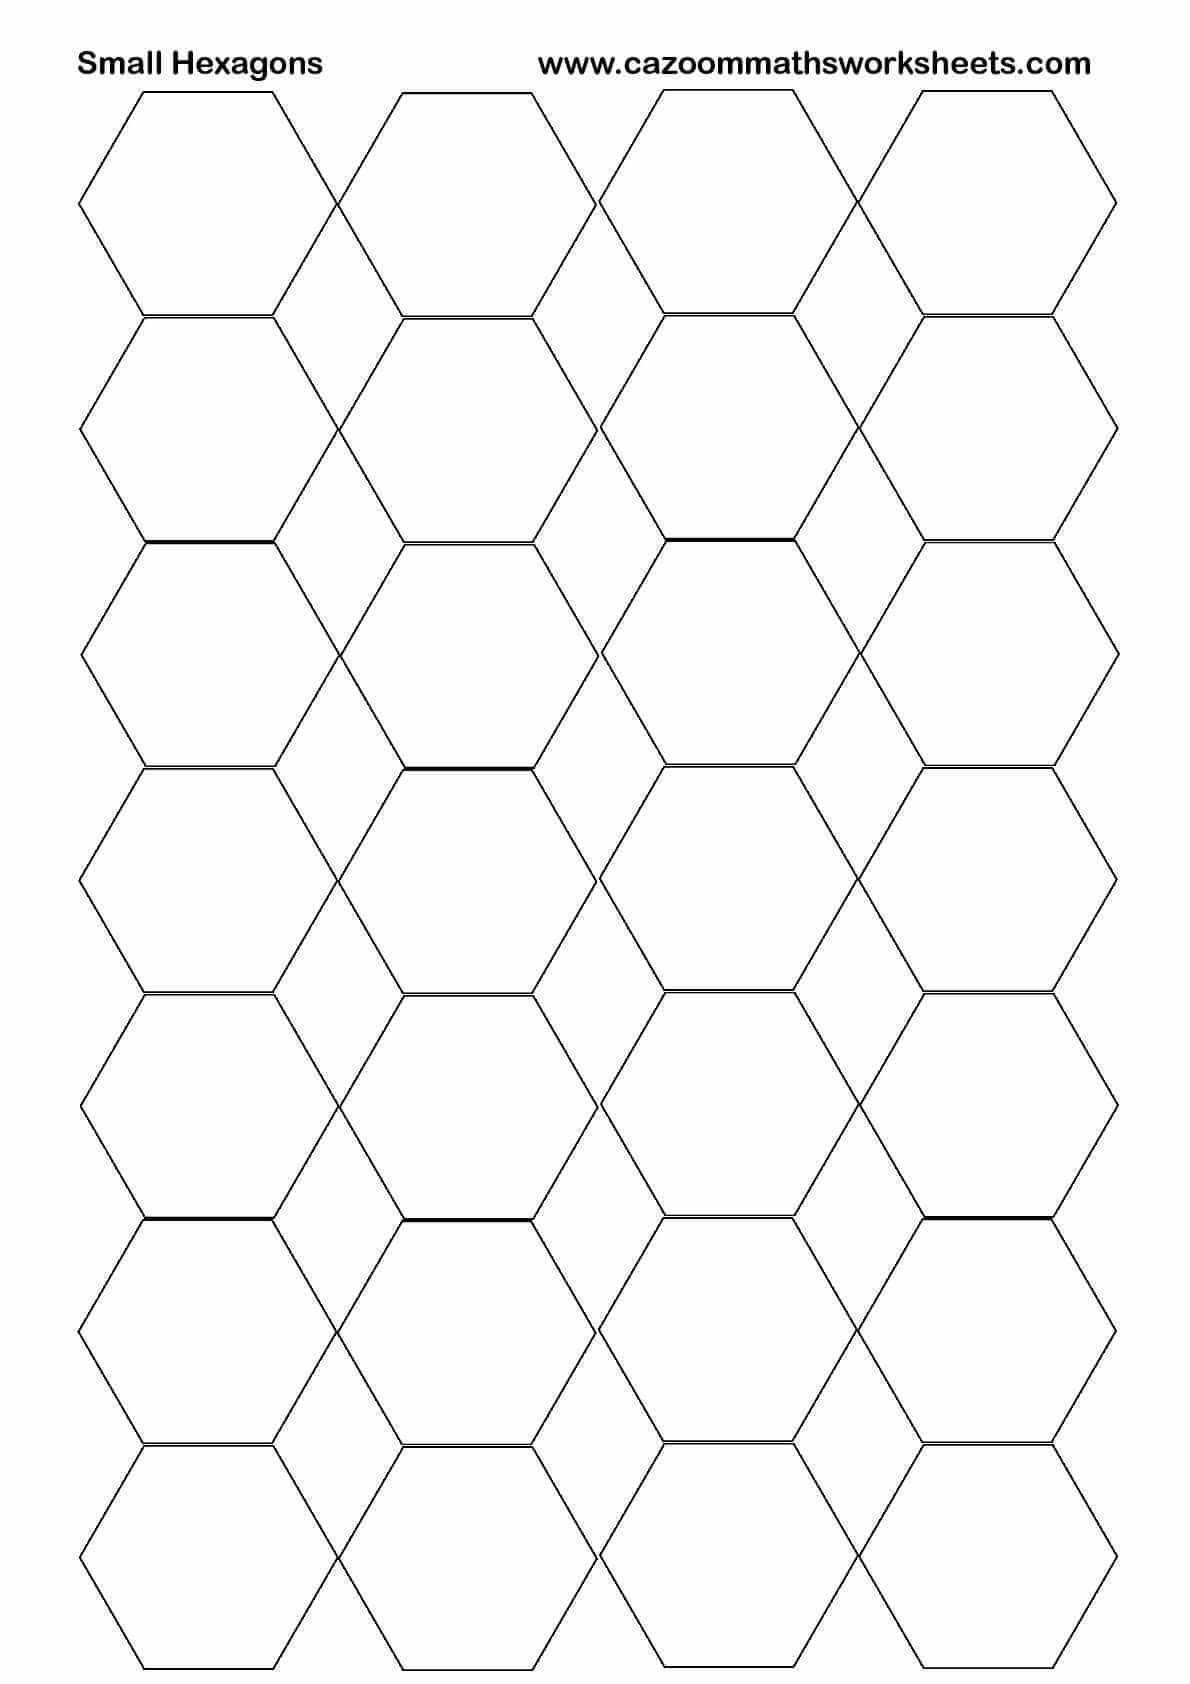 photograph regarding Printable Hexagons named Low Hexagons Printable Cazoom Maths Worksheets